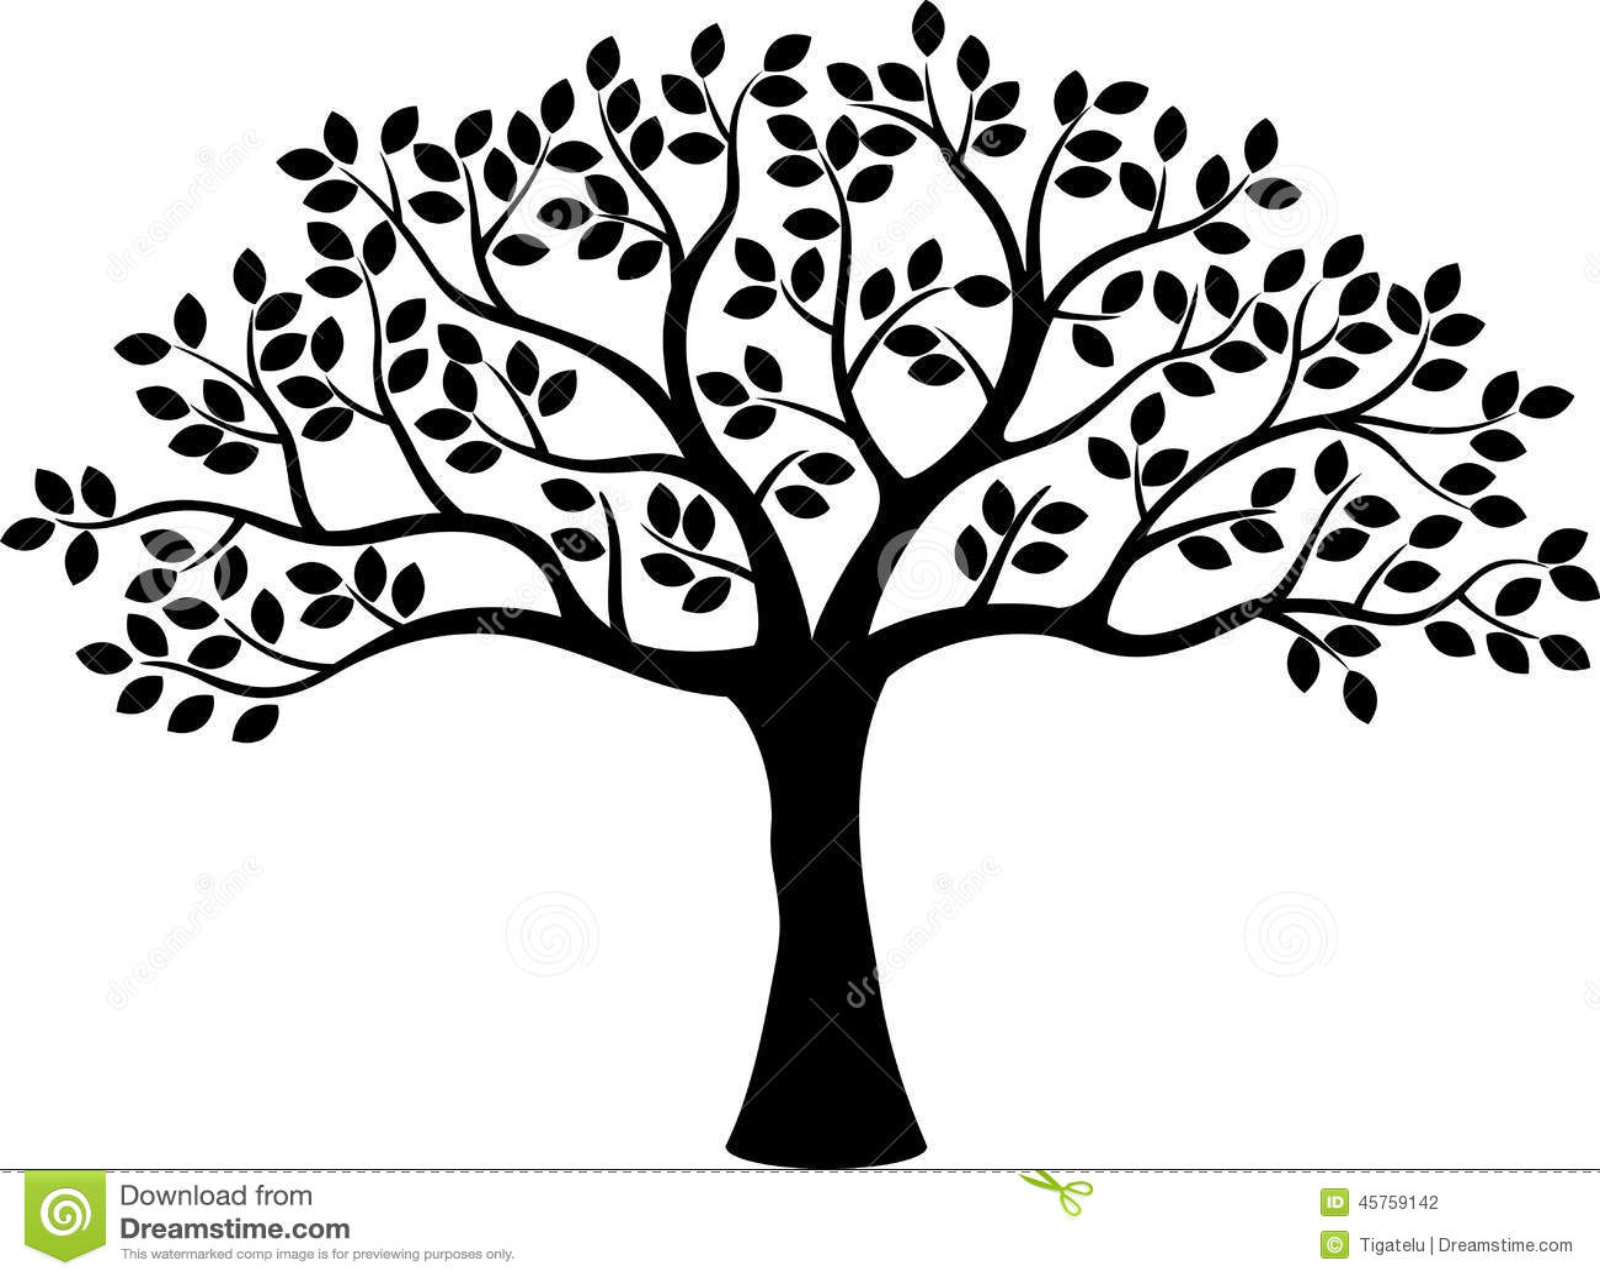 Silhouette Cartoon Tree Tree Silhouette Cartoon